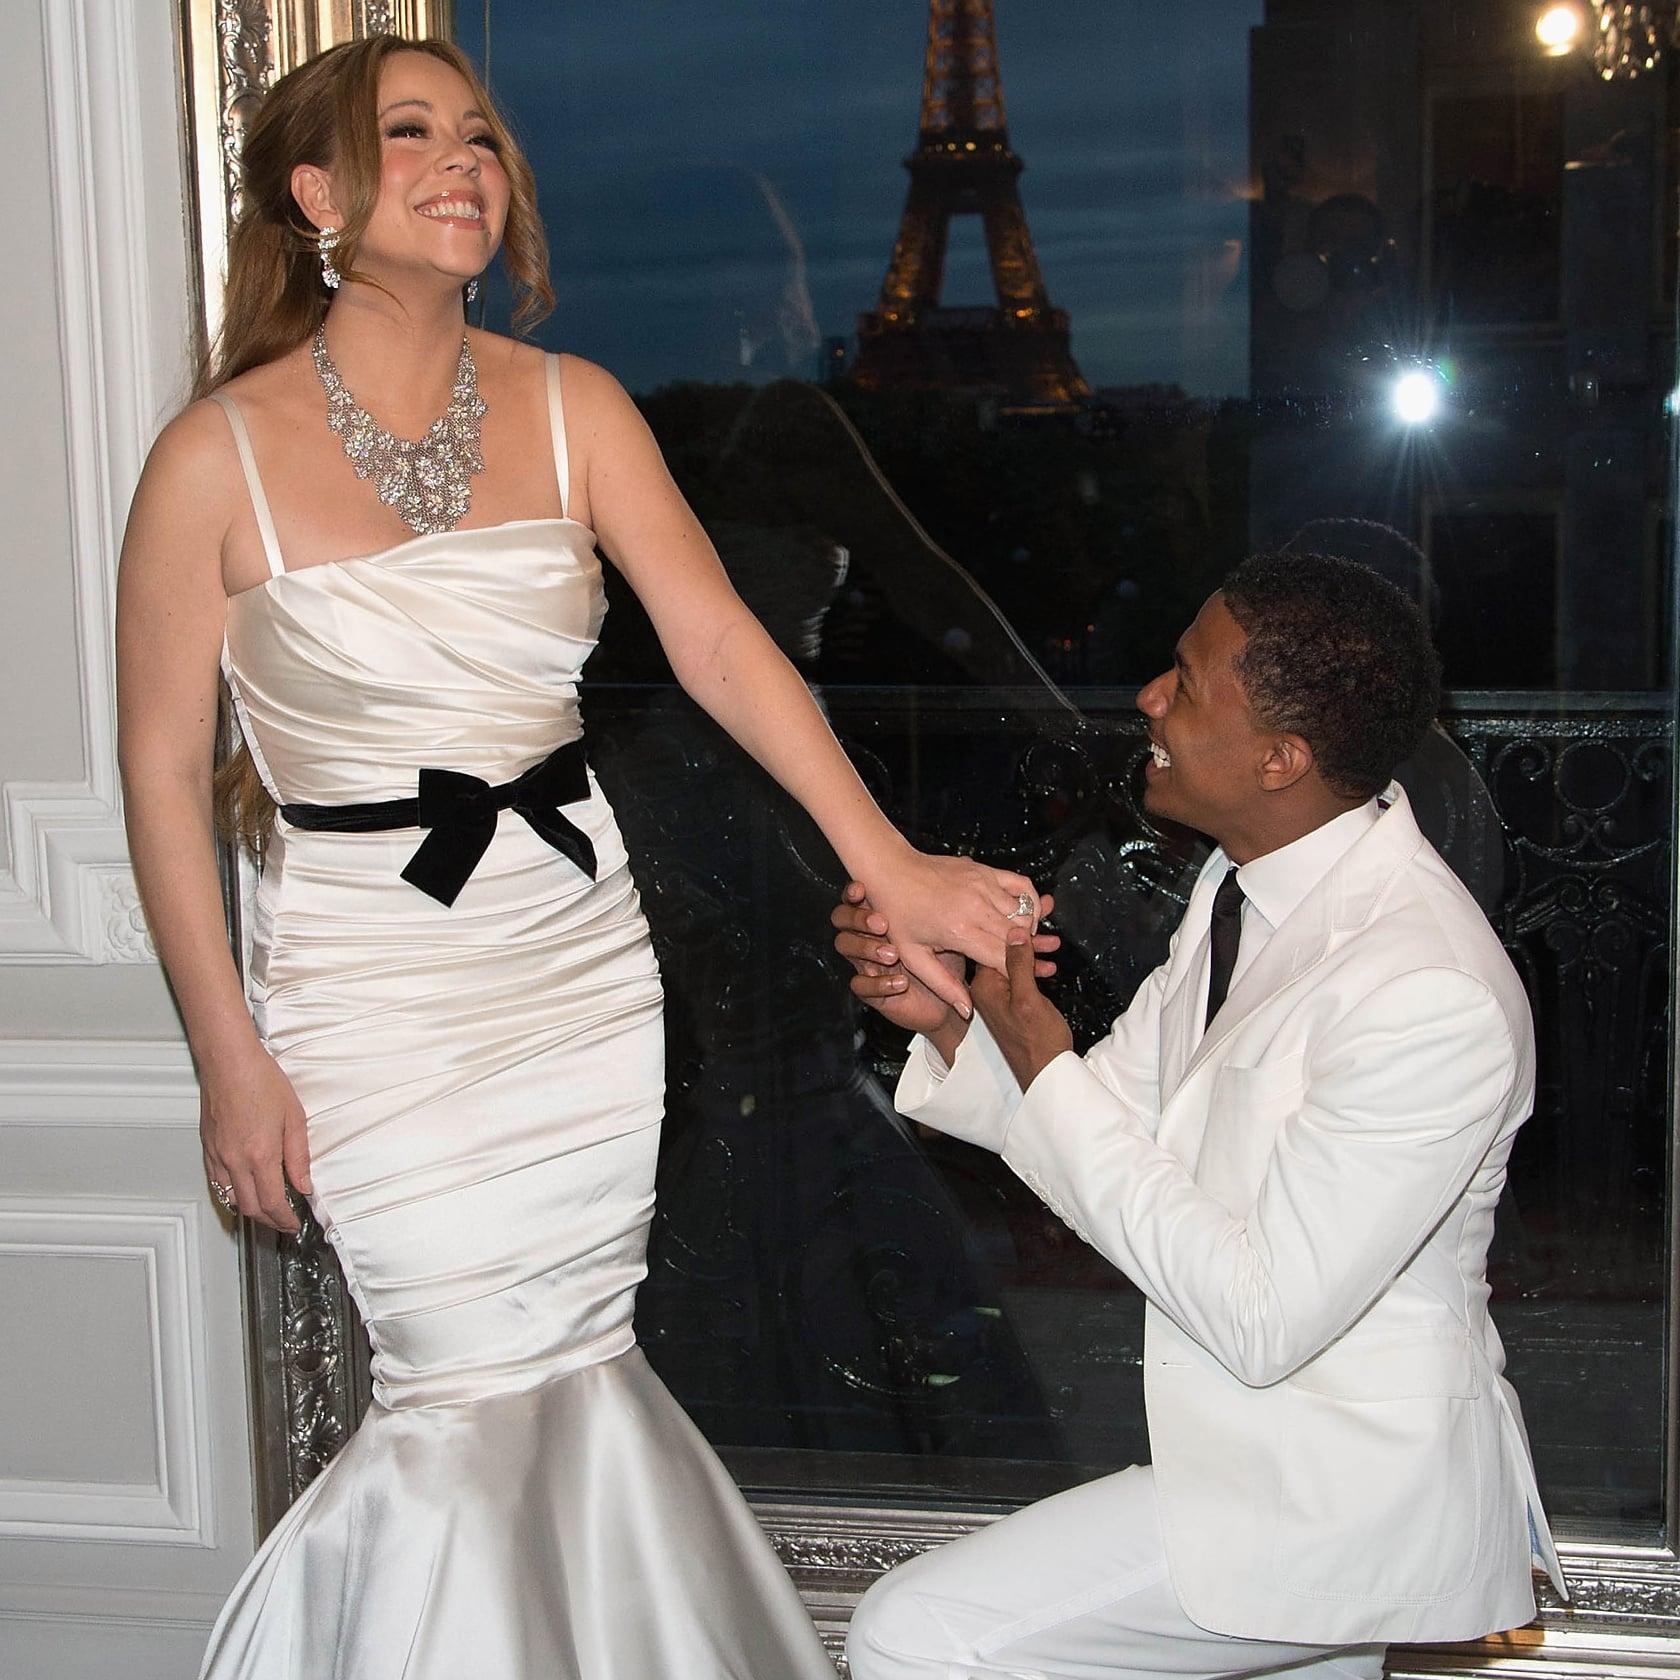 2010 Mariah Carey And Nick Cannon Wedding Pictures Popsugar Celebrity Photo 4: Nick Mariah Carey Wedding Ring At Websimilar.org